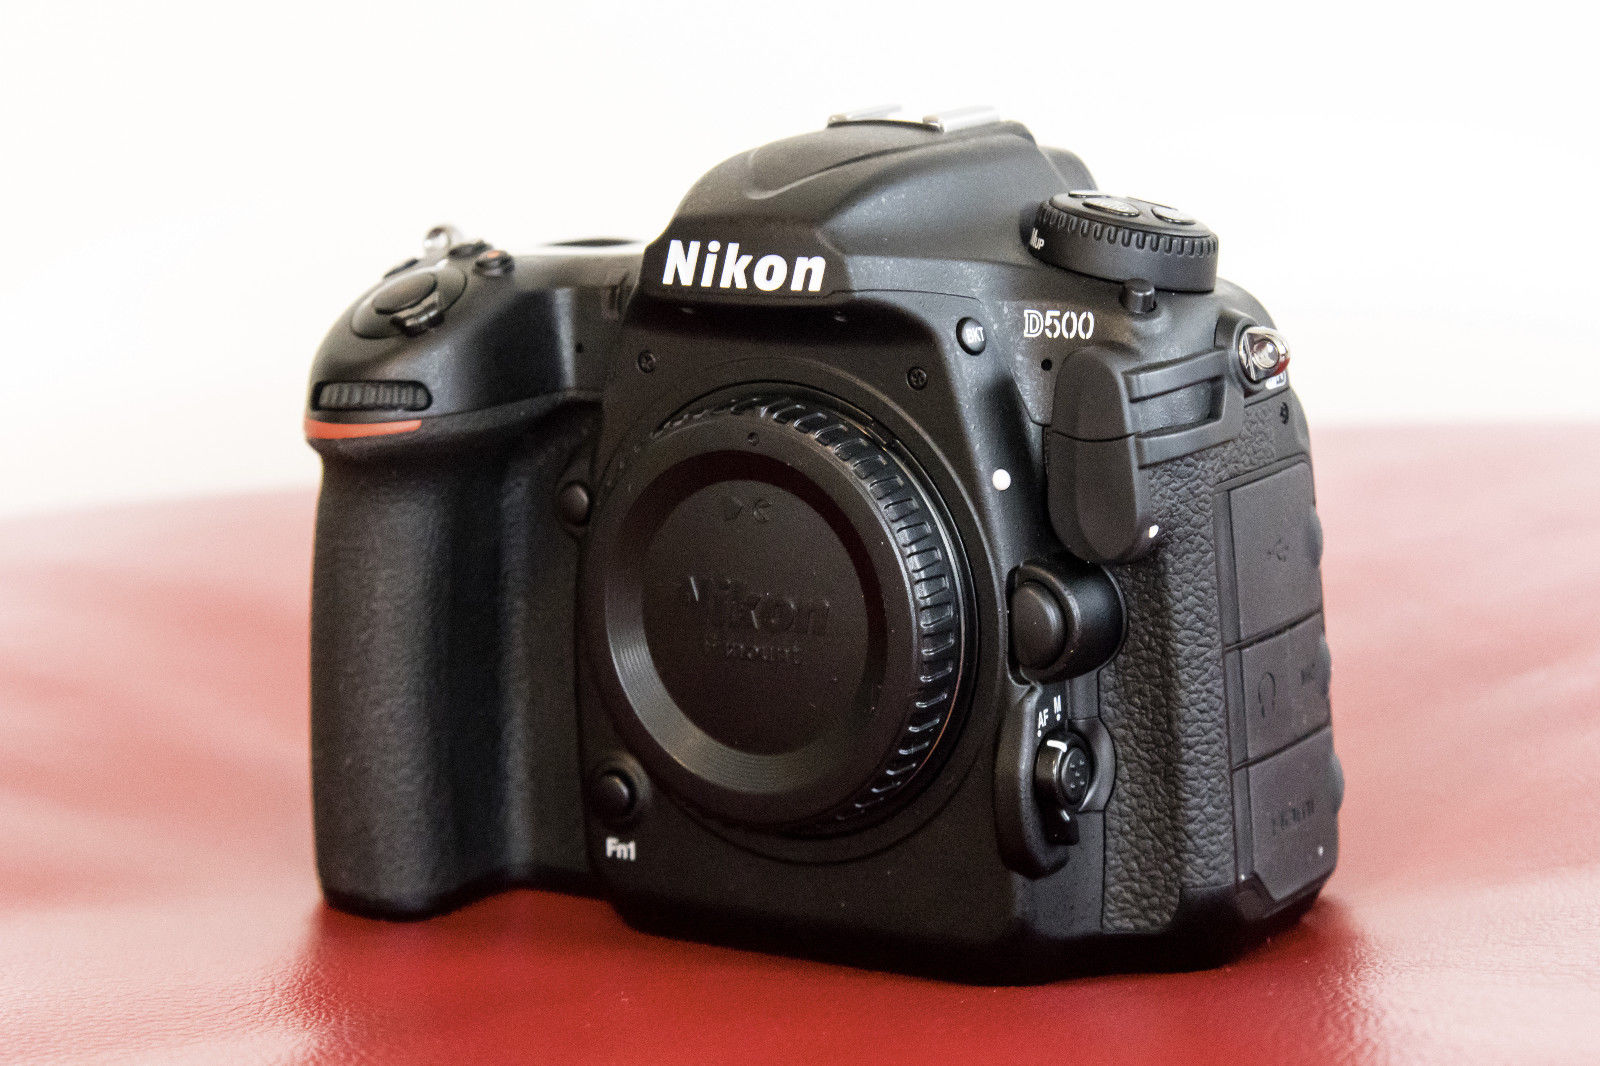 Body Nikon DSLR D500, 20.9MP (nur Gehäuse), incl. Amazon-Rechnung v. 03.08.2017